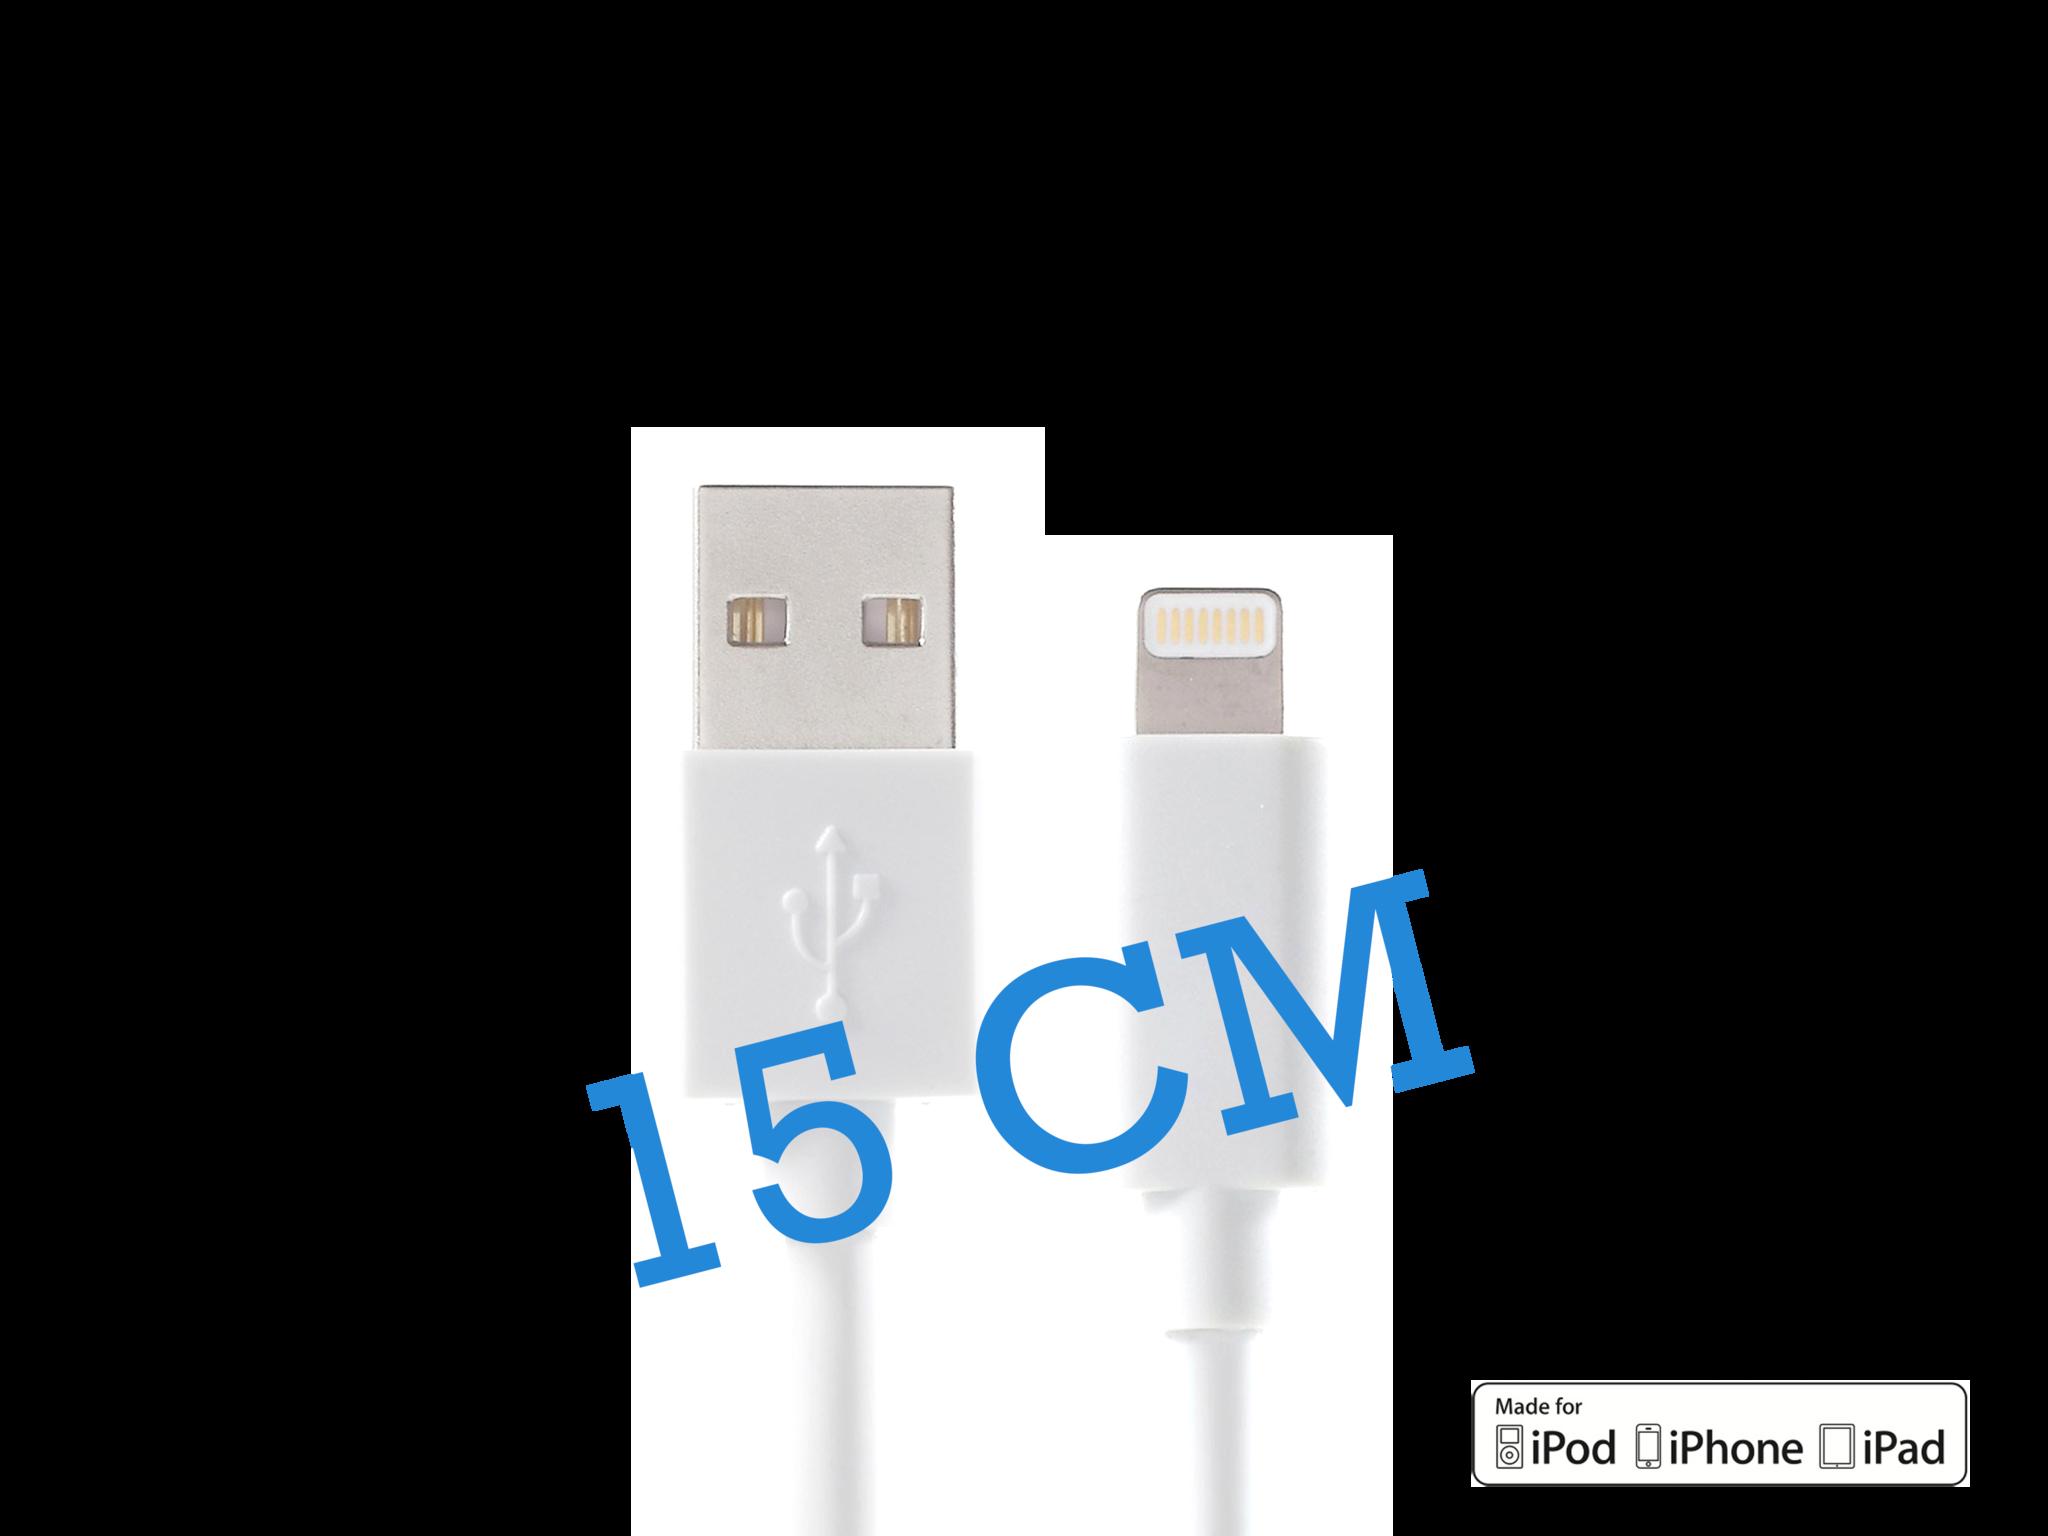 iPhone kabel 15 cm